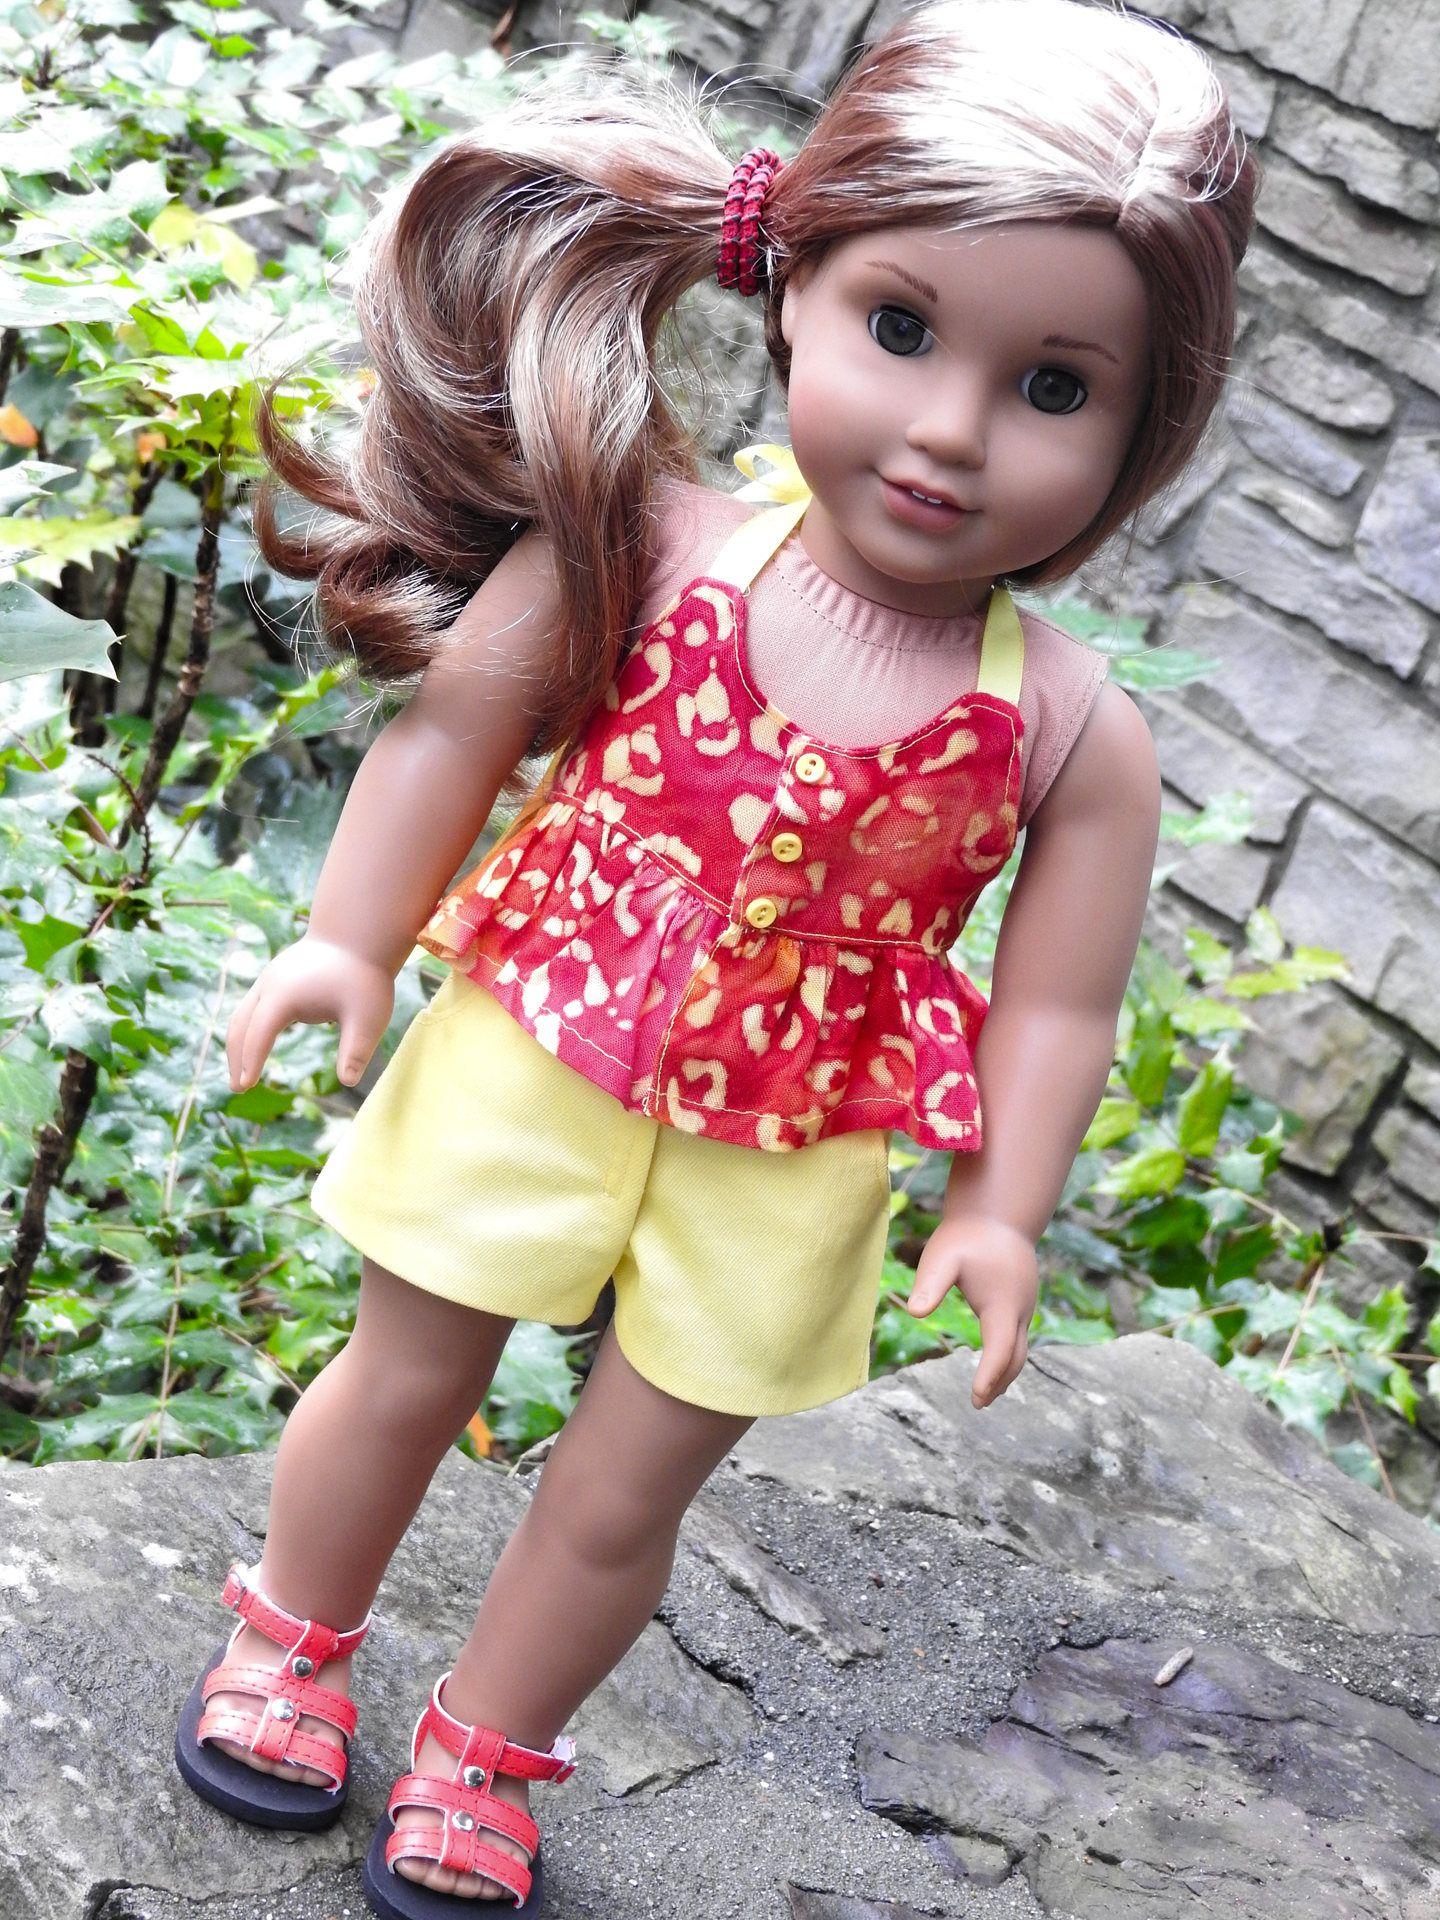 18 Inch Doll Clothes, AG Doll Clothes, 18 Inch Doll Shorts & Halter ...